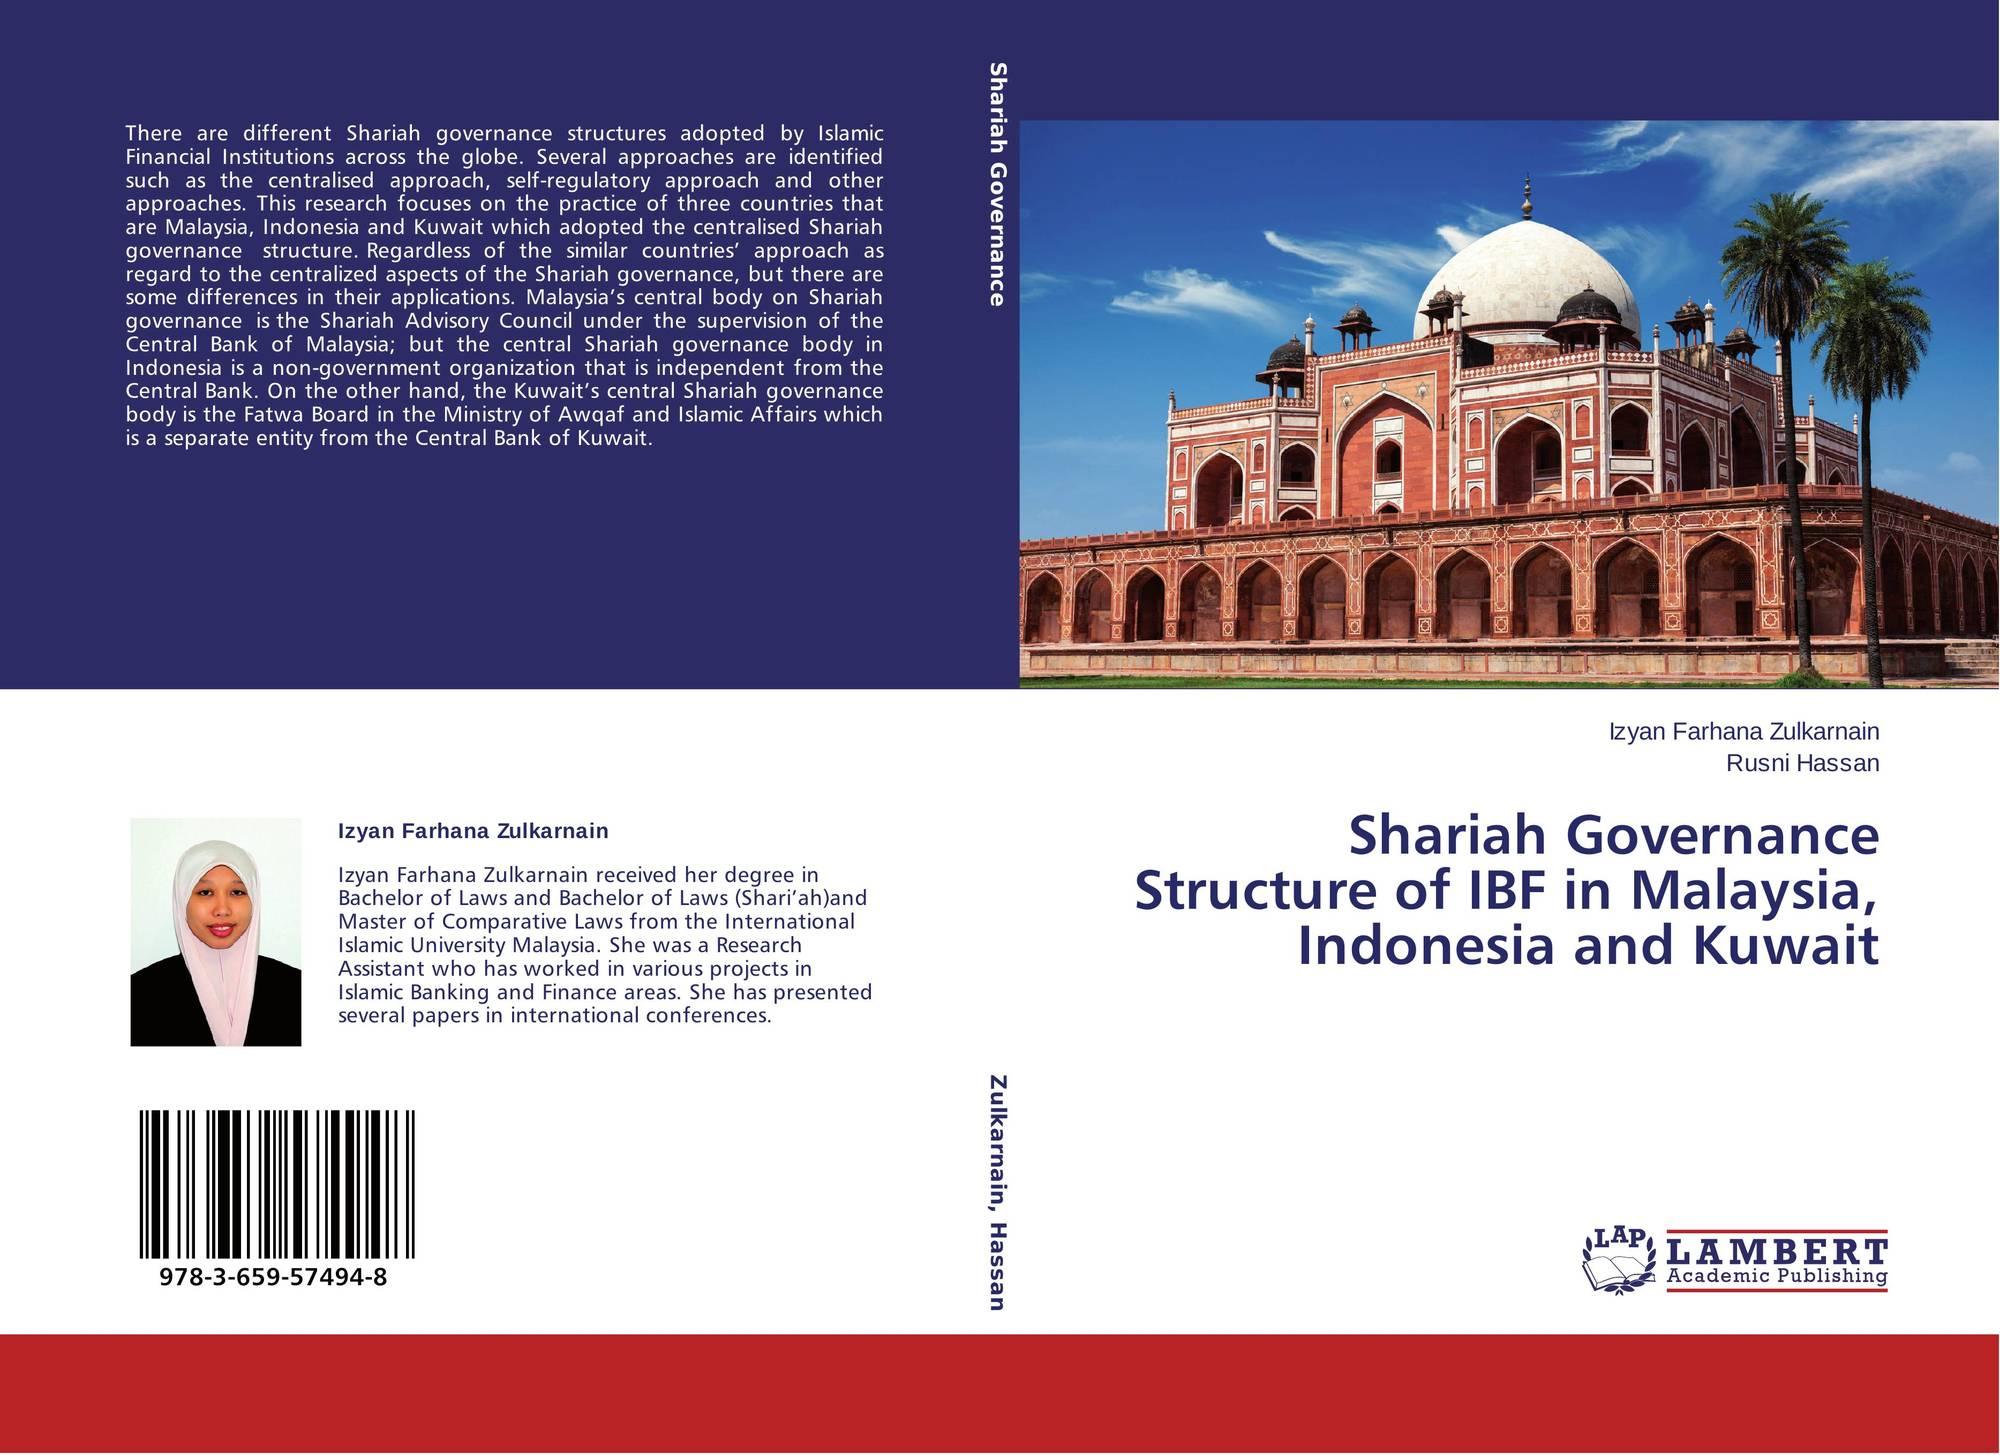 shariah govarnence for islamic financial institutions Rodney wilson (2009), 'shari'ah governance for islamic financial institutions' (journal of islamic finance, 1(1) pp59-75) this is an internationally peer.